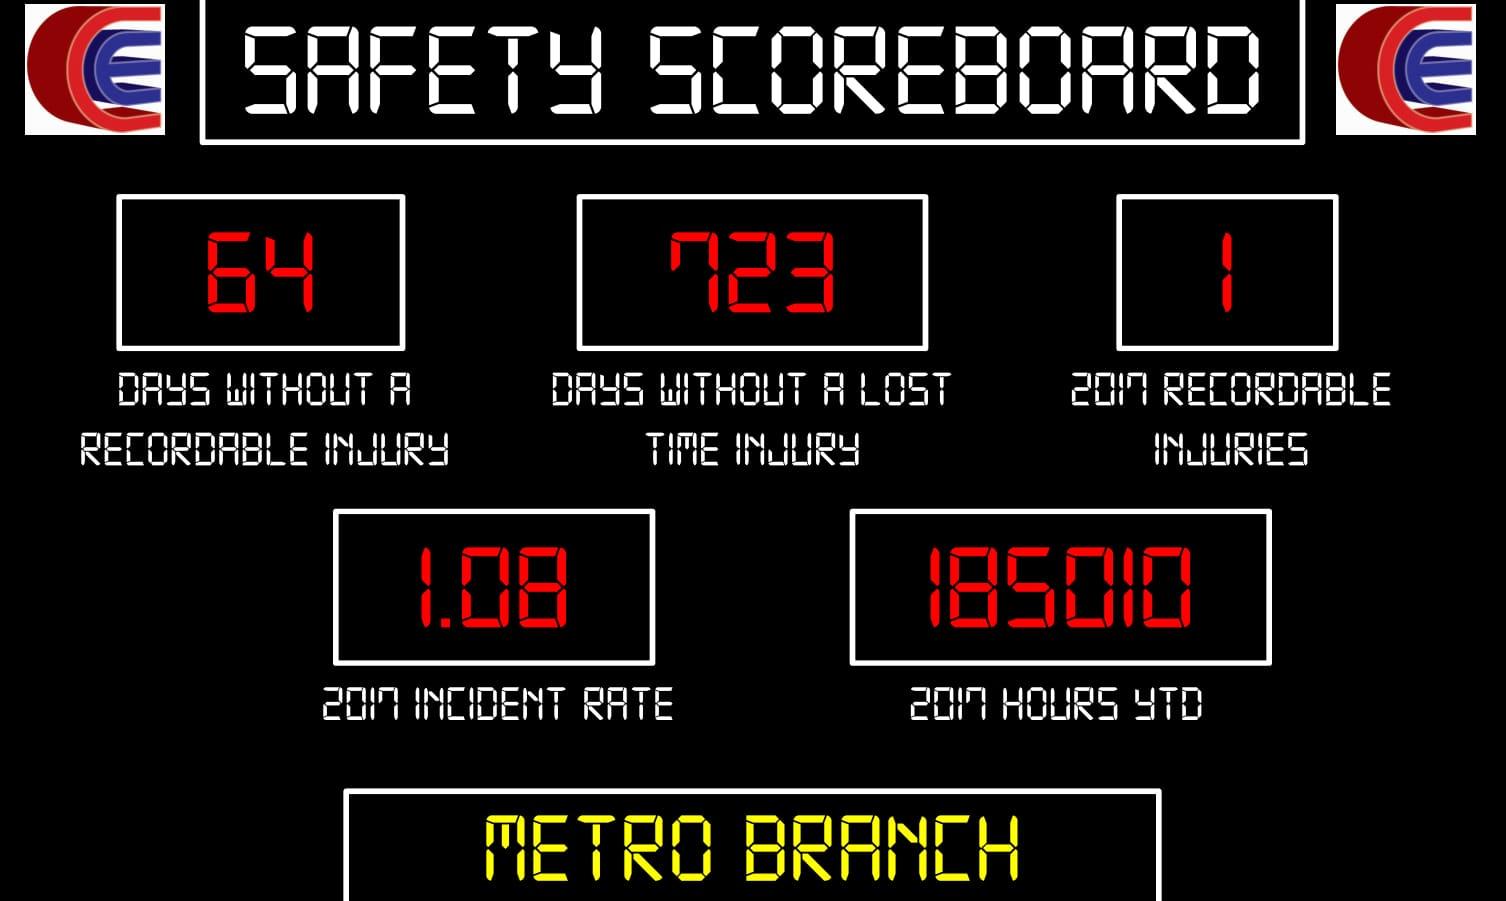 Safety Scoreboard-6